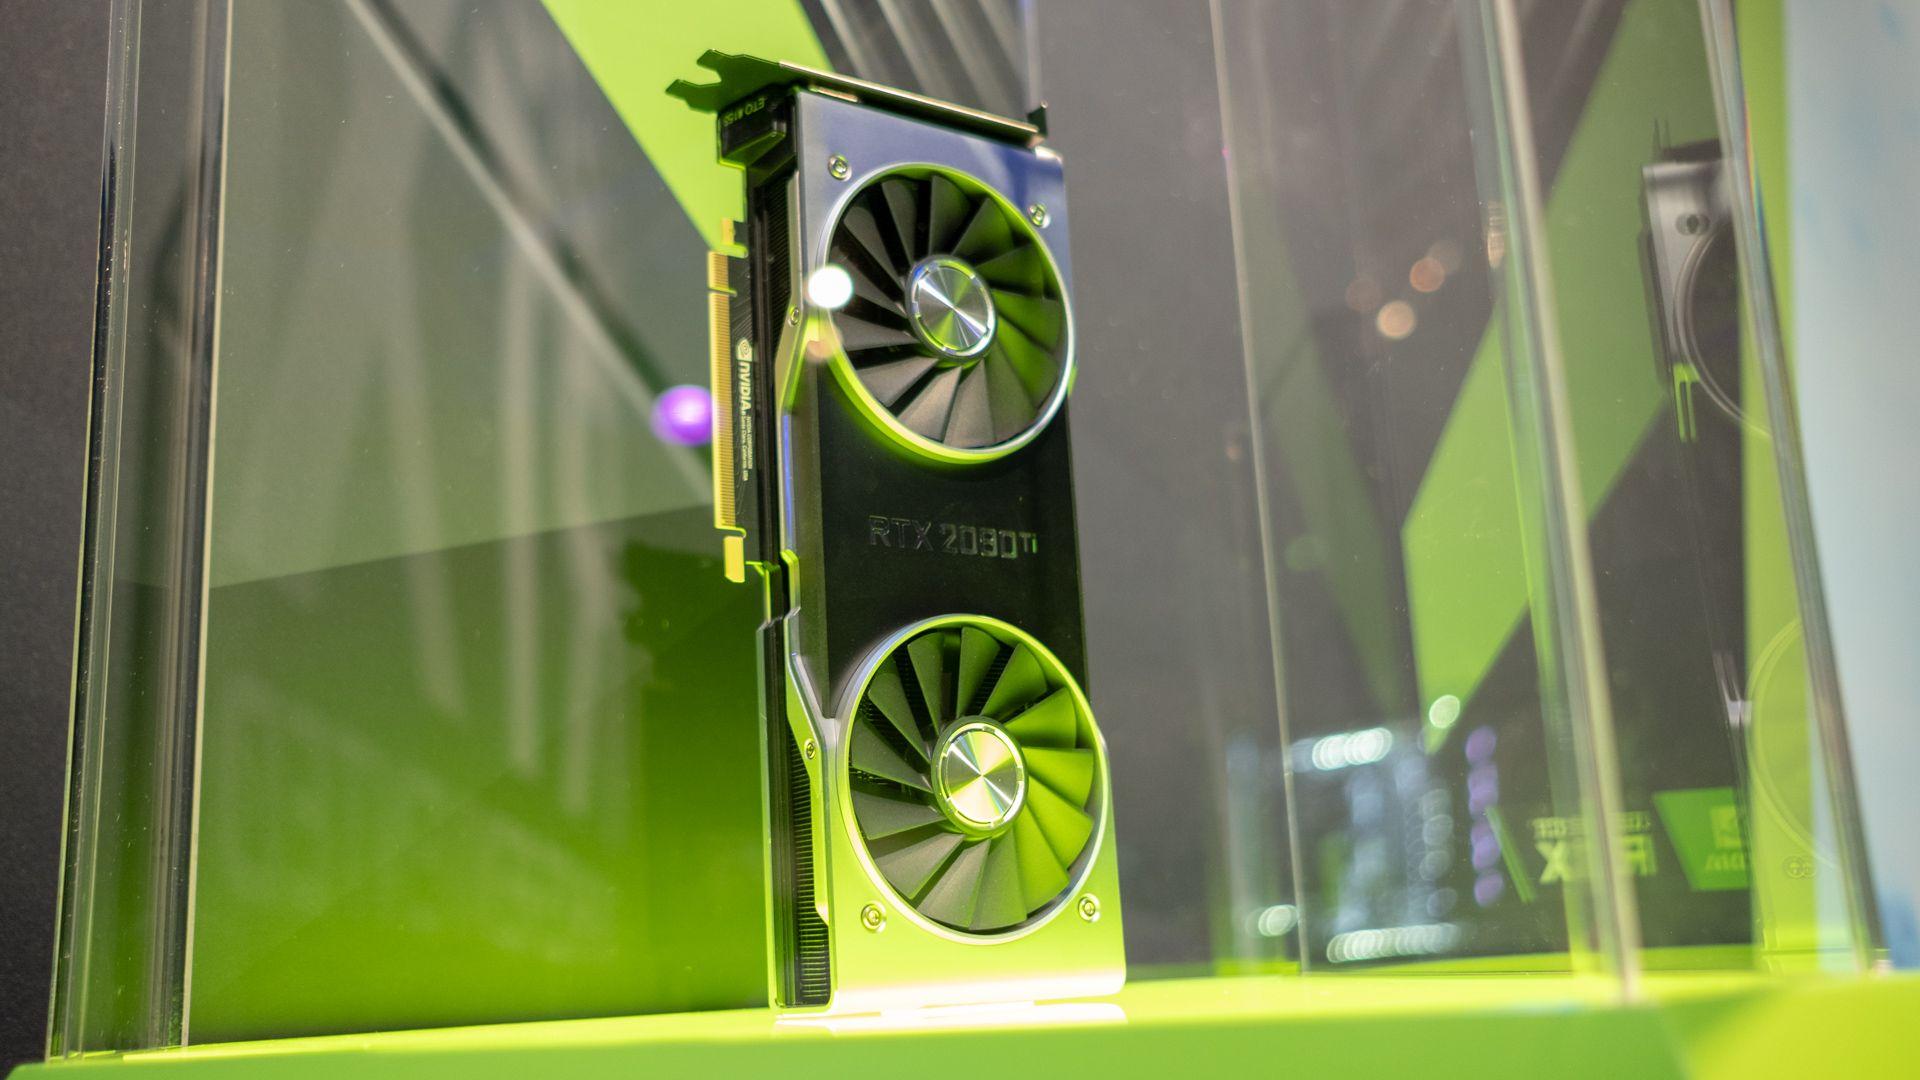 Nvidia GeForce RTX 2080 Ti | technology | Pc setup, Gaming setup, Pc